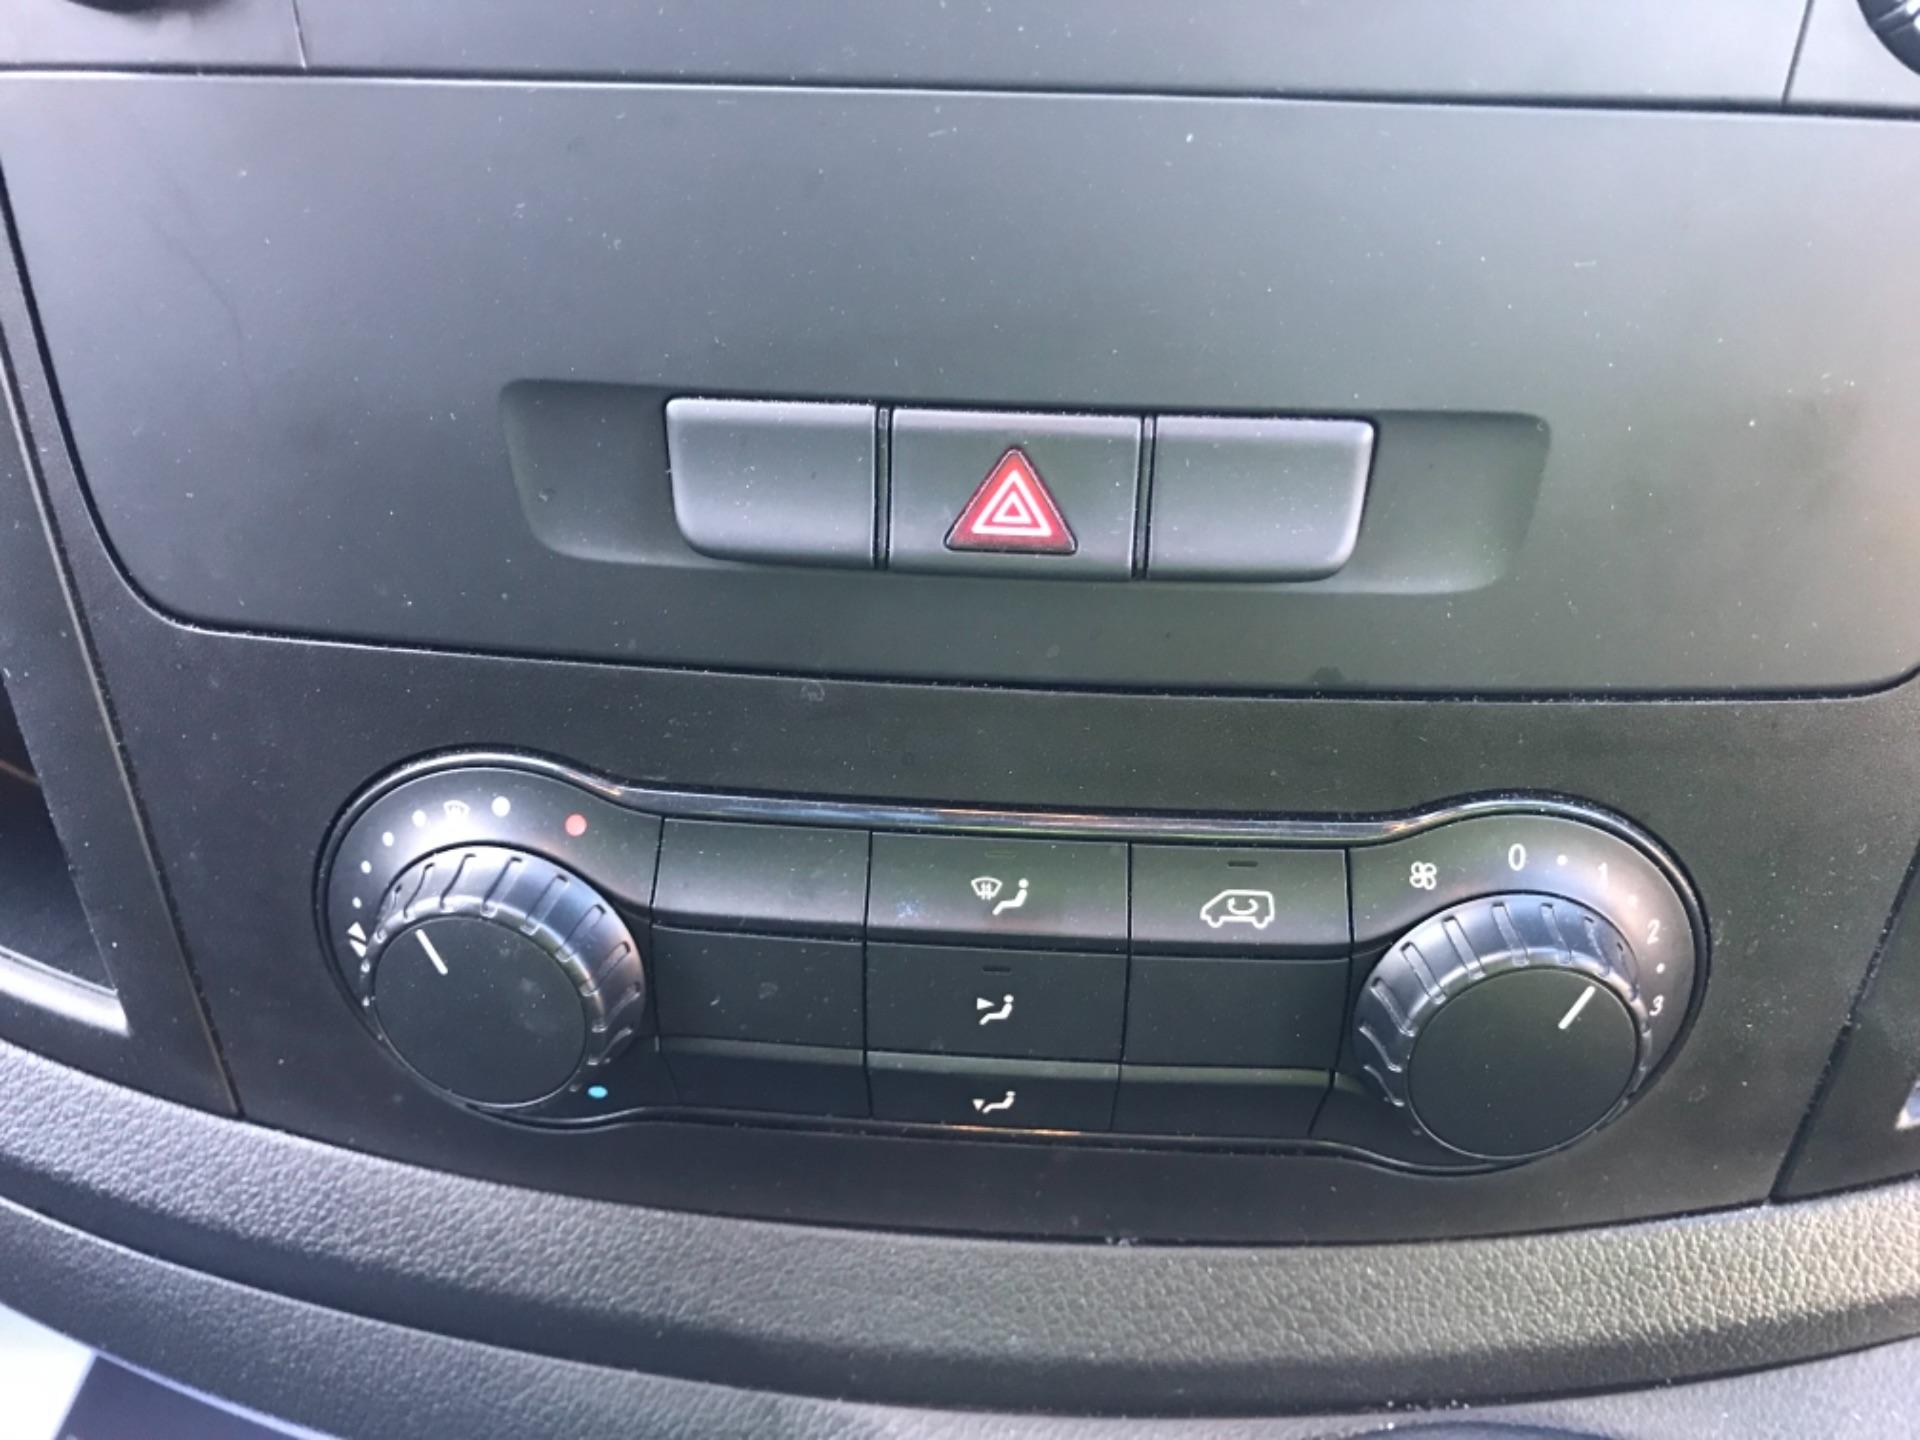 2017 Mercedes-Benz Vito LONG 111 CDI VAN EURO 6  (KM67BKY) Image 18